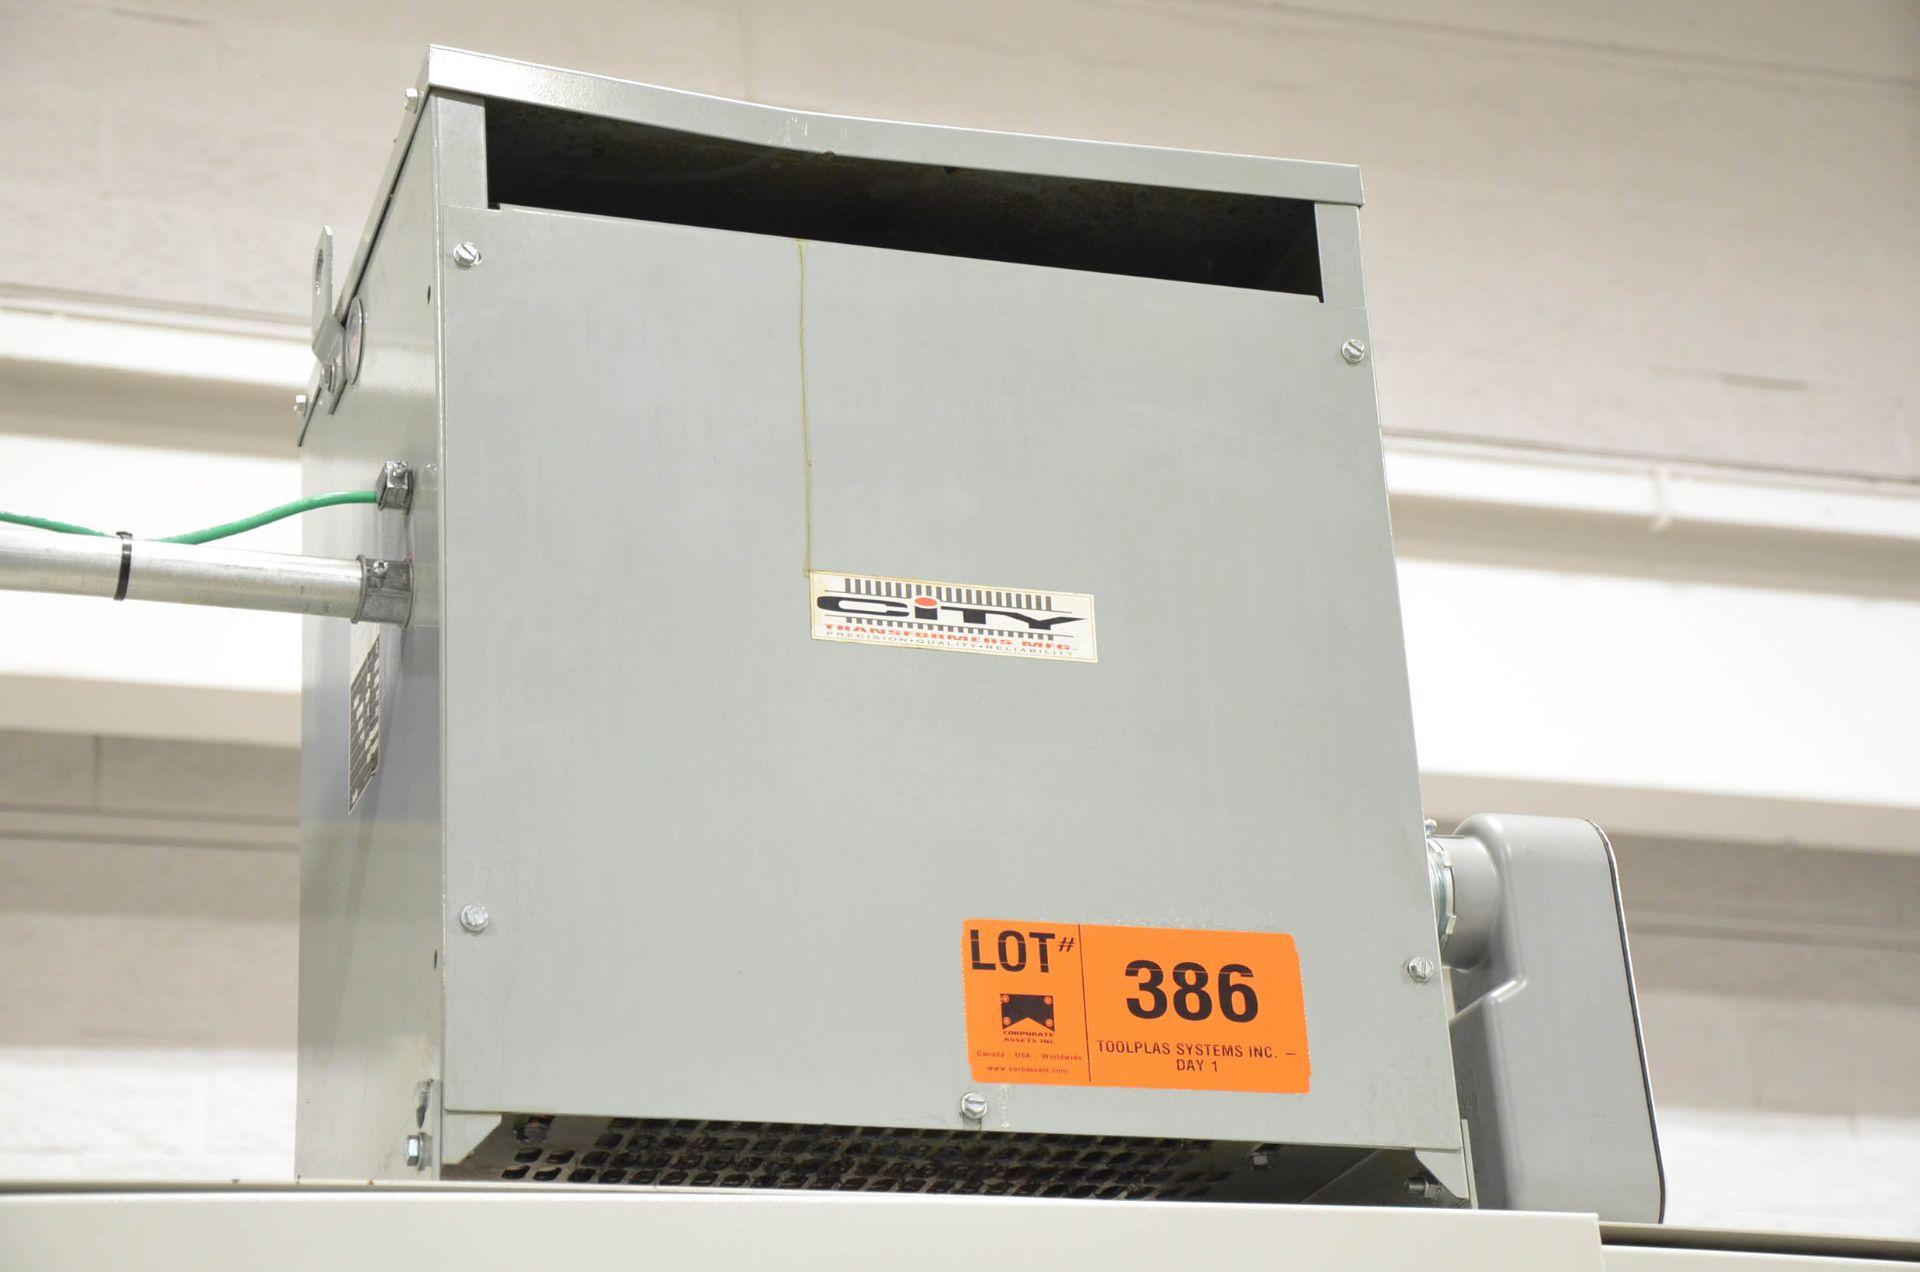 REX 45KVA/600-220V/3PH/60HZ TRANSFORMER (CI) [RIGGING FEES FOR LOT #386 - $50 USD PLUS APPLICABLE